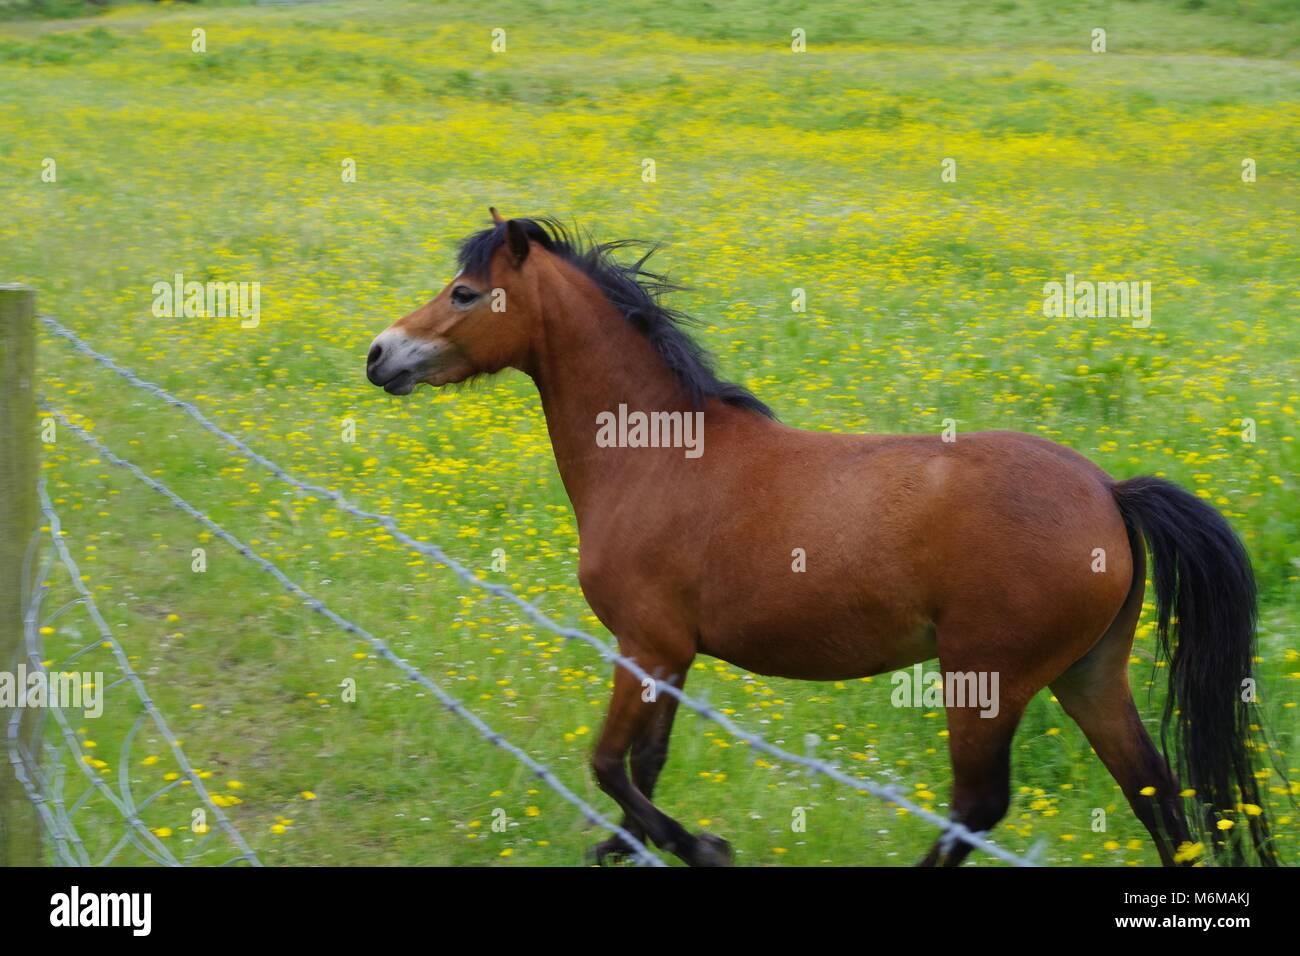 Horse Chestnut Britain Stock Photos & Horse Chestnut ... - photo#21